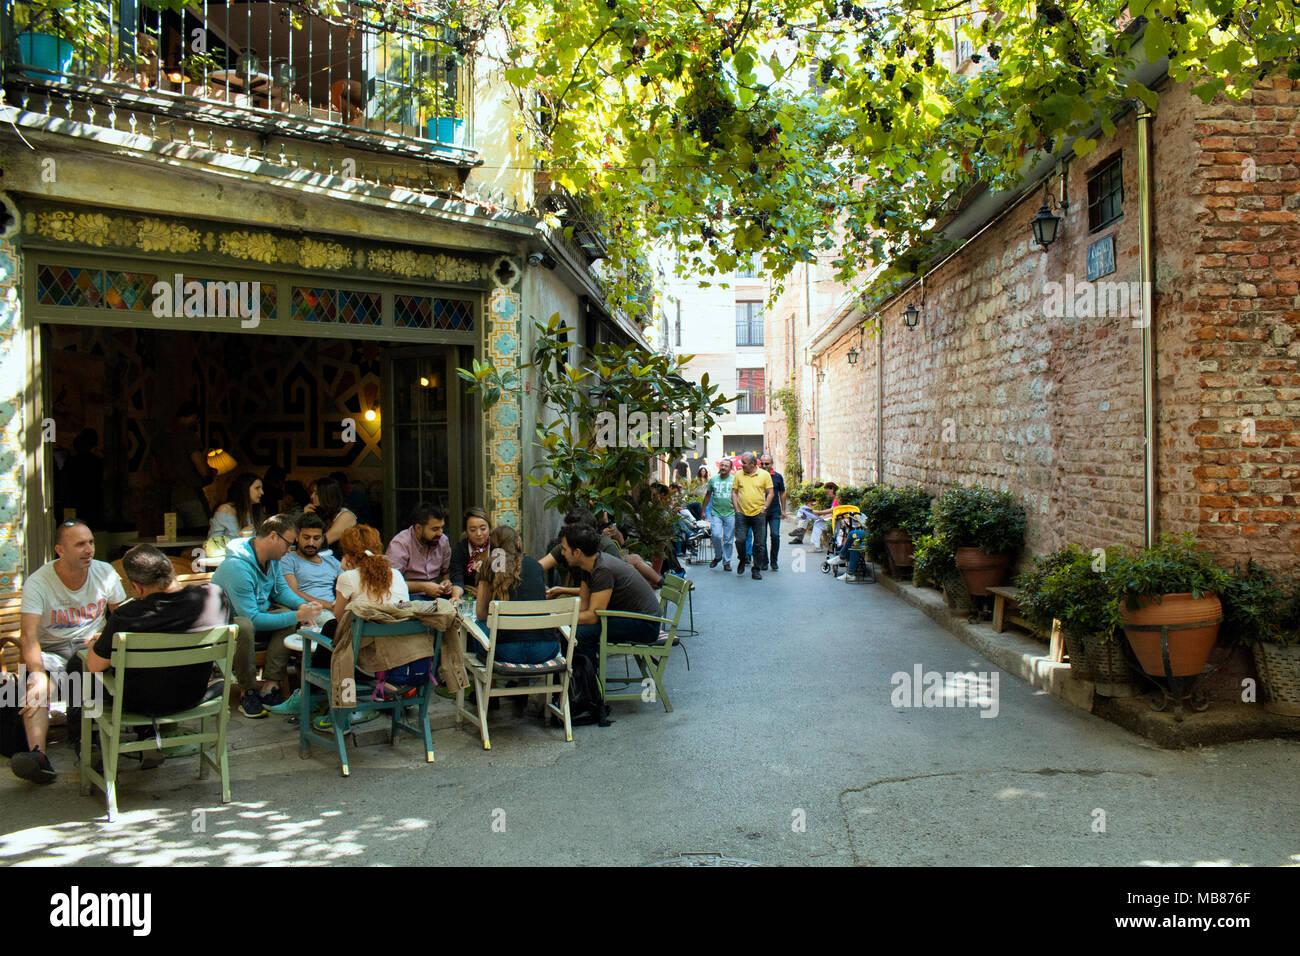 People enjoy nice weather at famous cafe in hip neighborhood Karakoy in Istanbul. Stock Photo